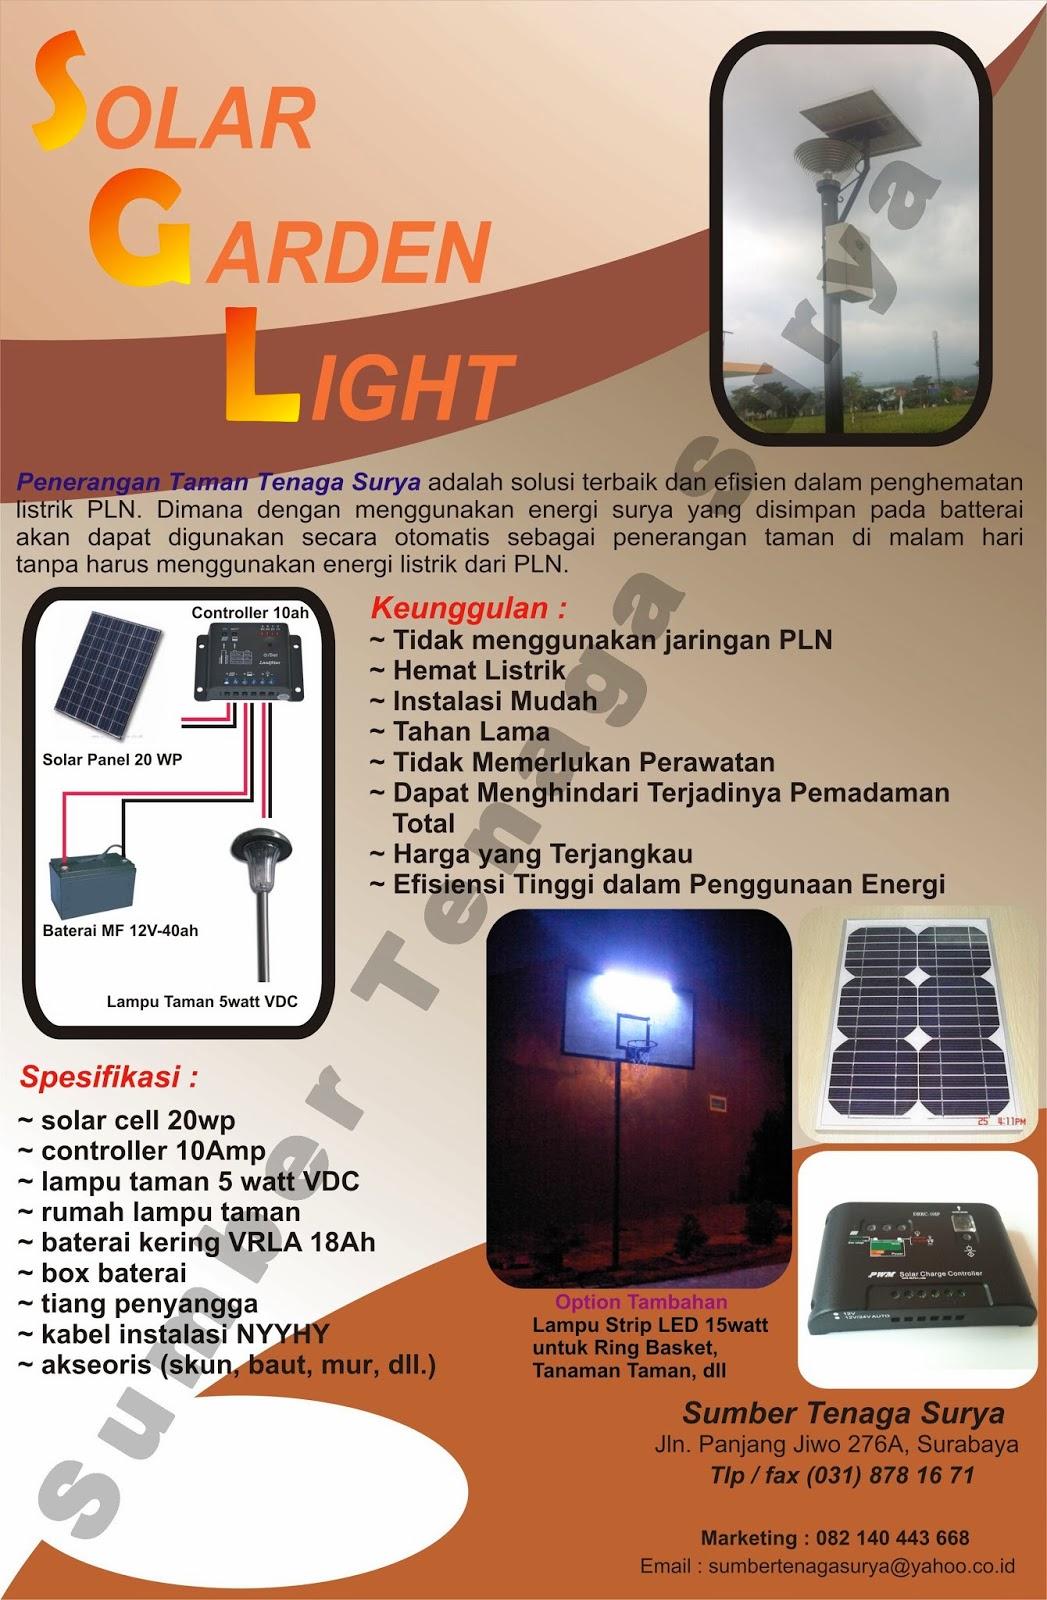 Sumber Tenaga Surya Surabaya Spesialis Pju Tenaga Surya Solar Home System Dan Baterai Vrla Lampu Taman Tenaga Surya